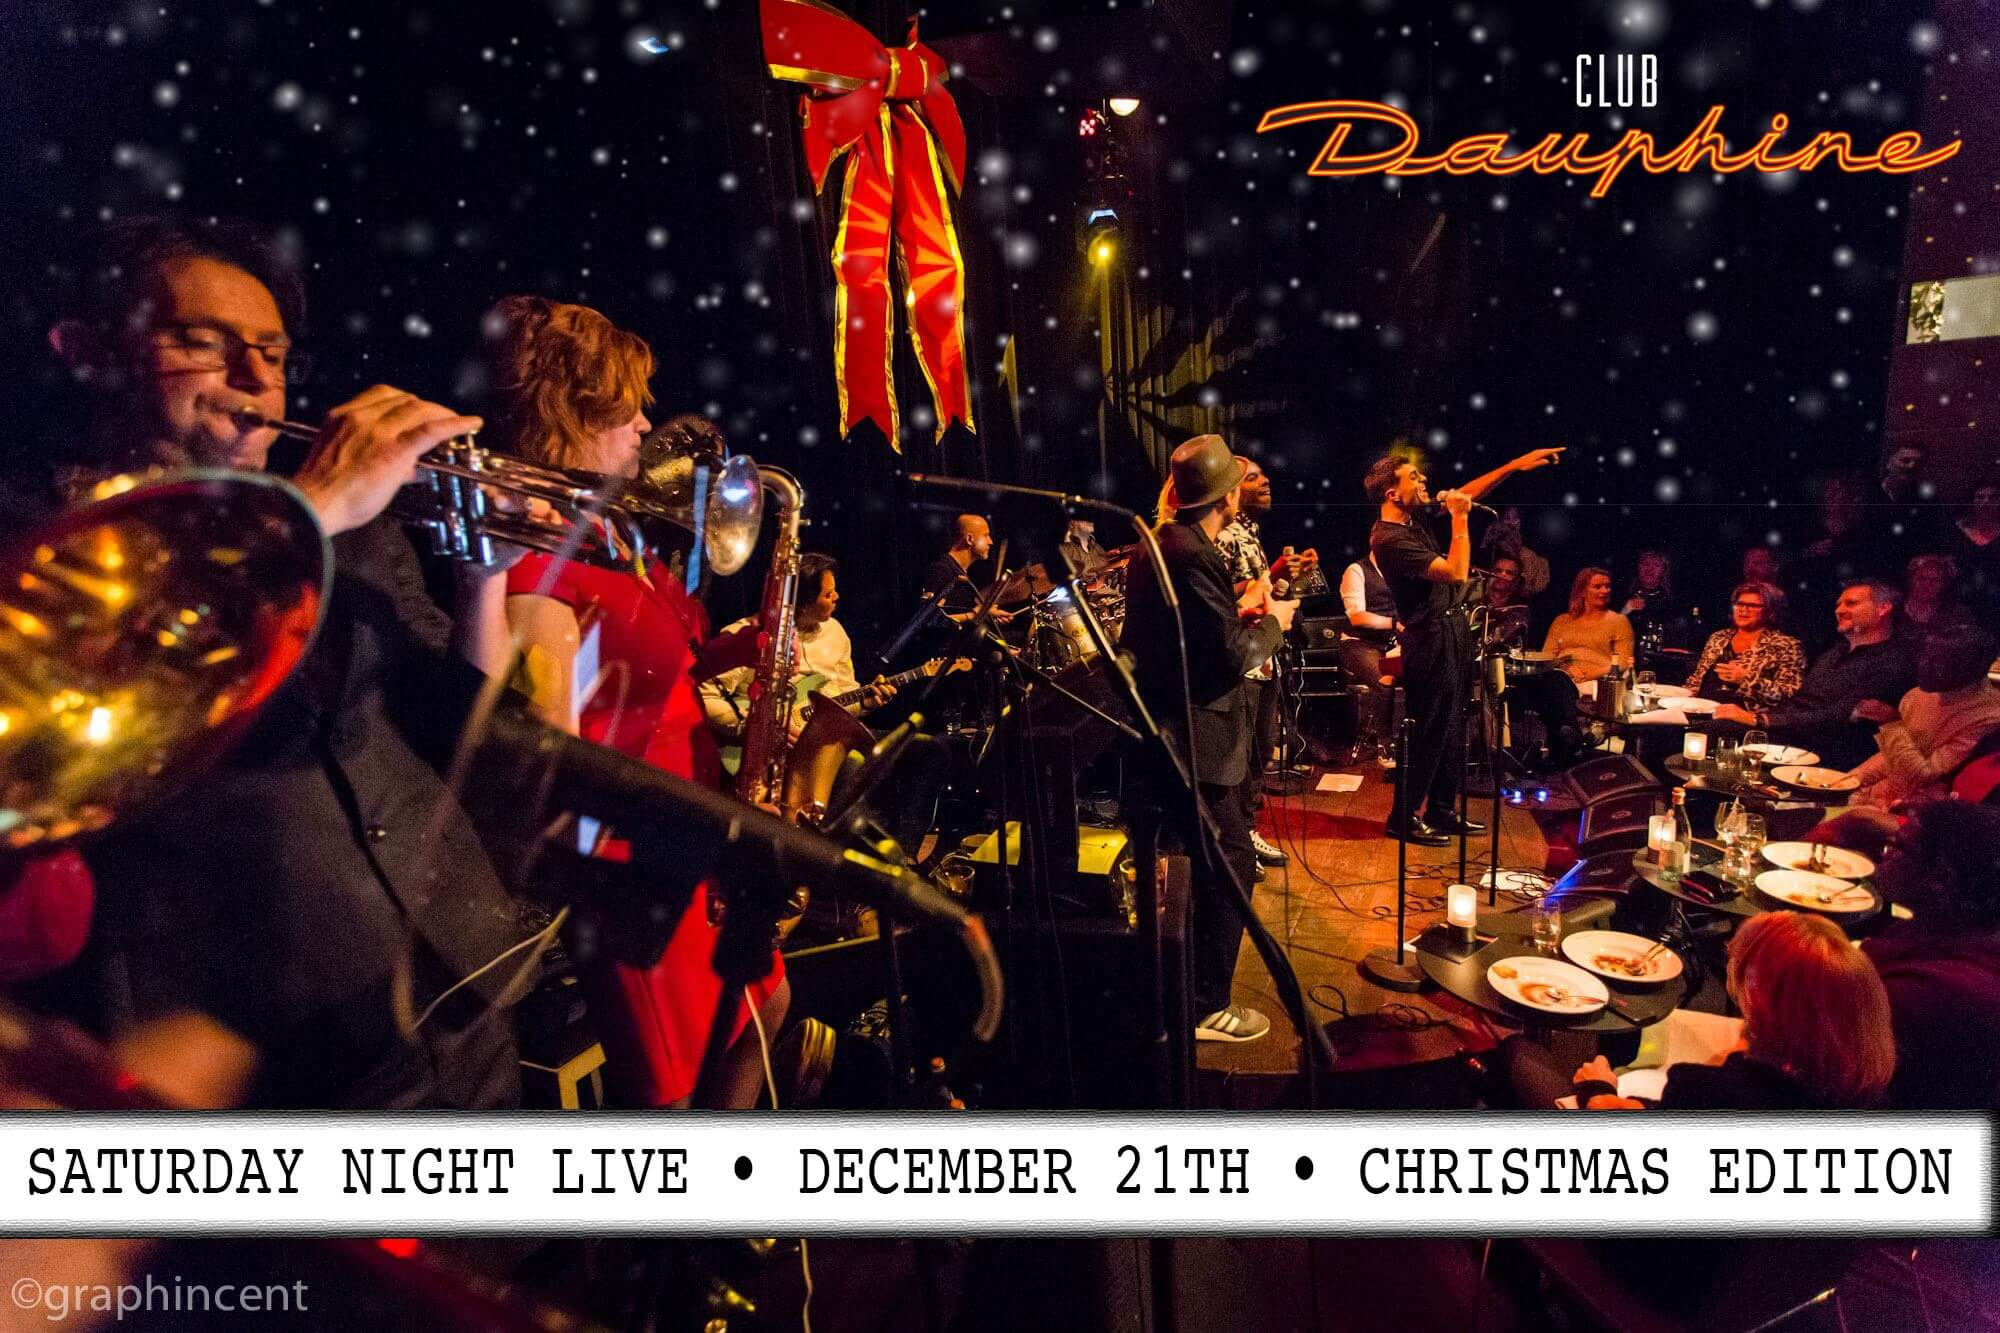 Club Dauphine – Saturday Christmas Edition- 21 Dec